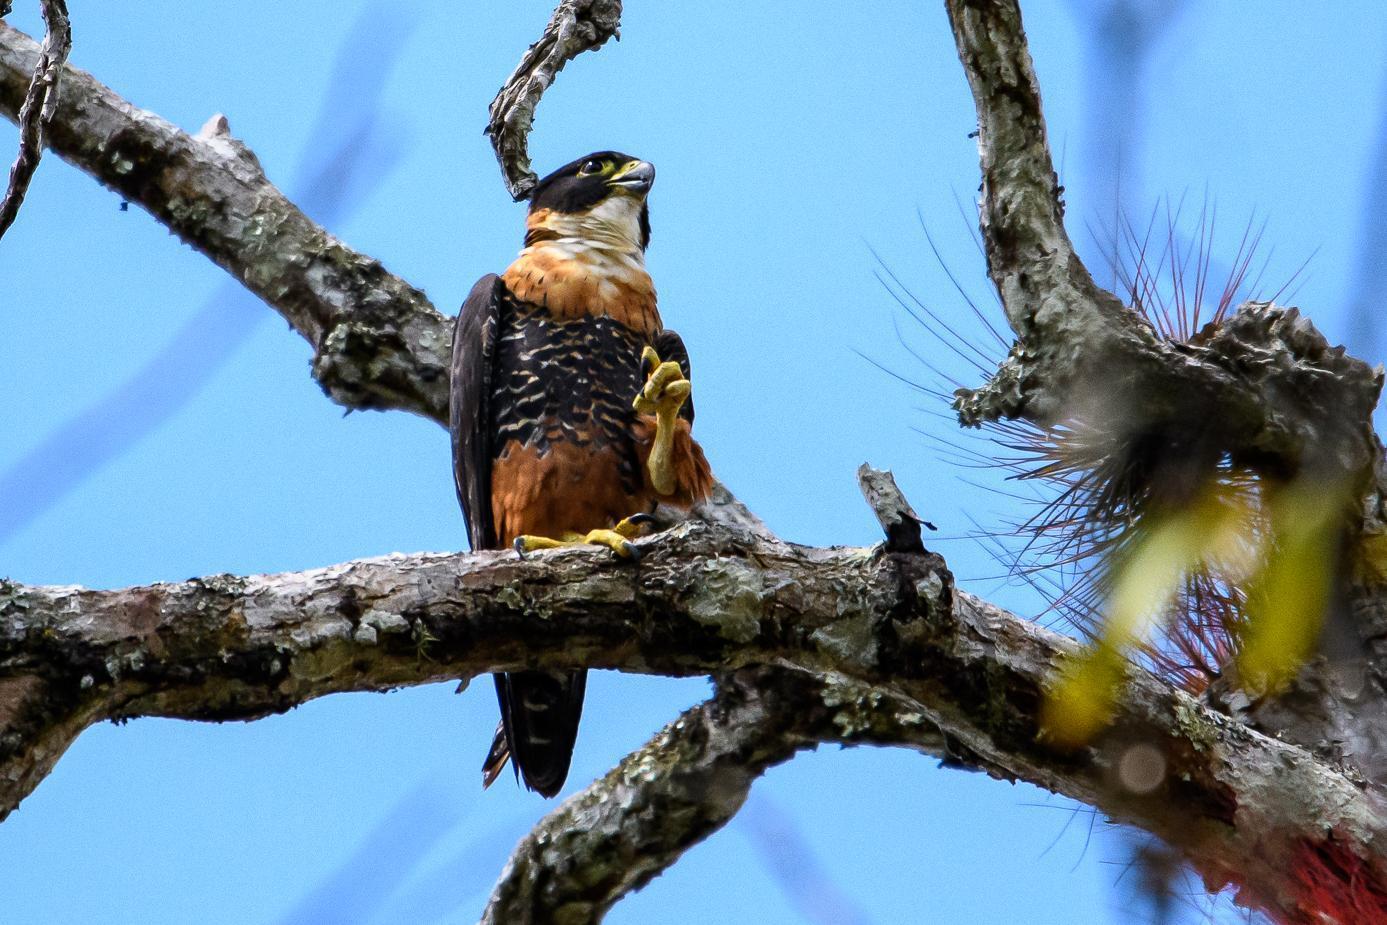 Orange-breasted Falcon Photo by Gerald Hoekstra